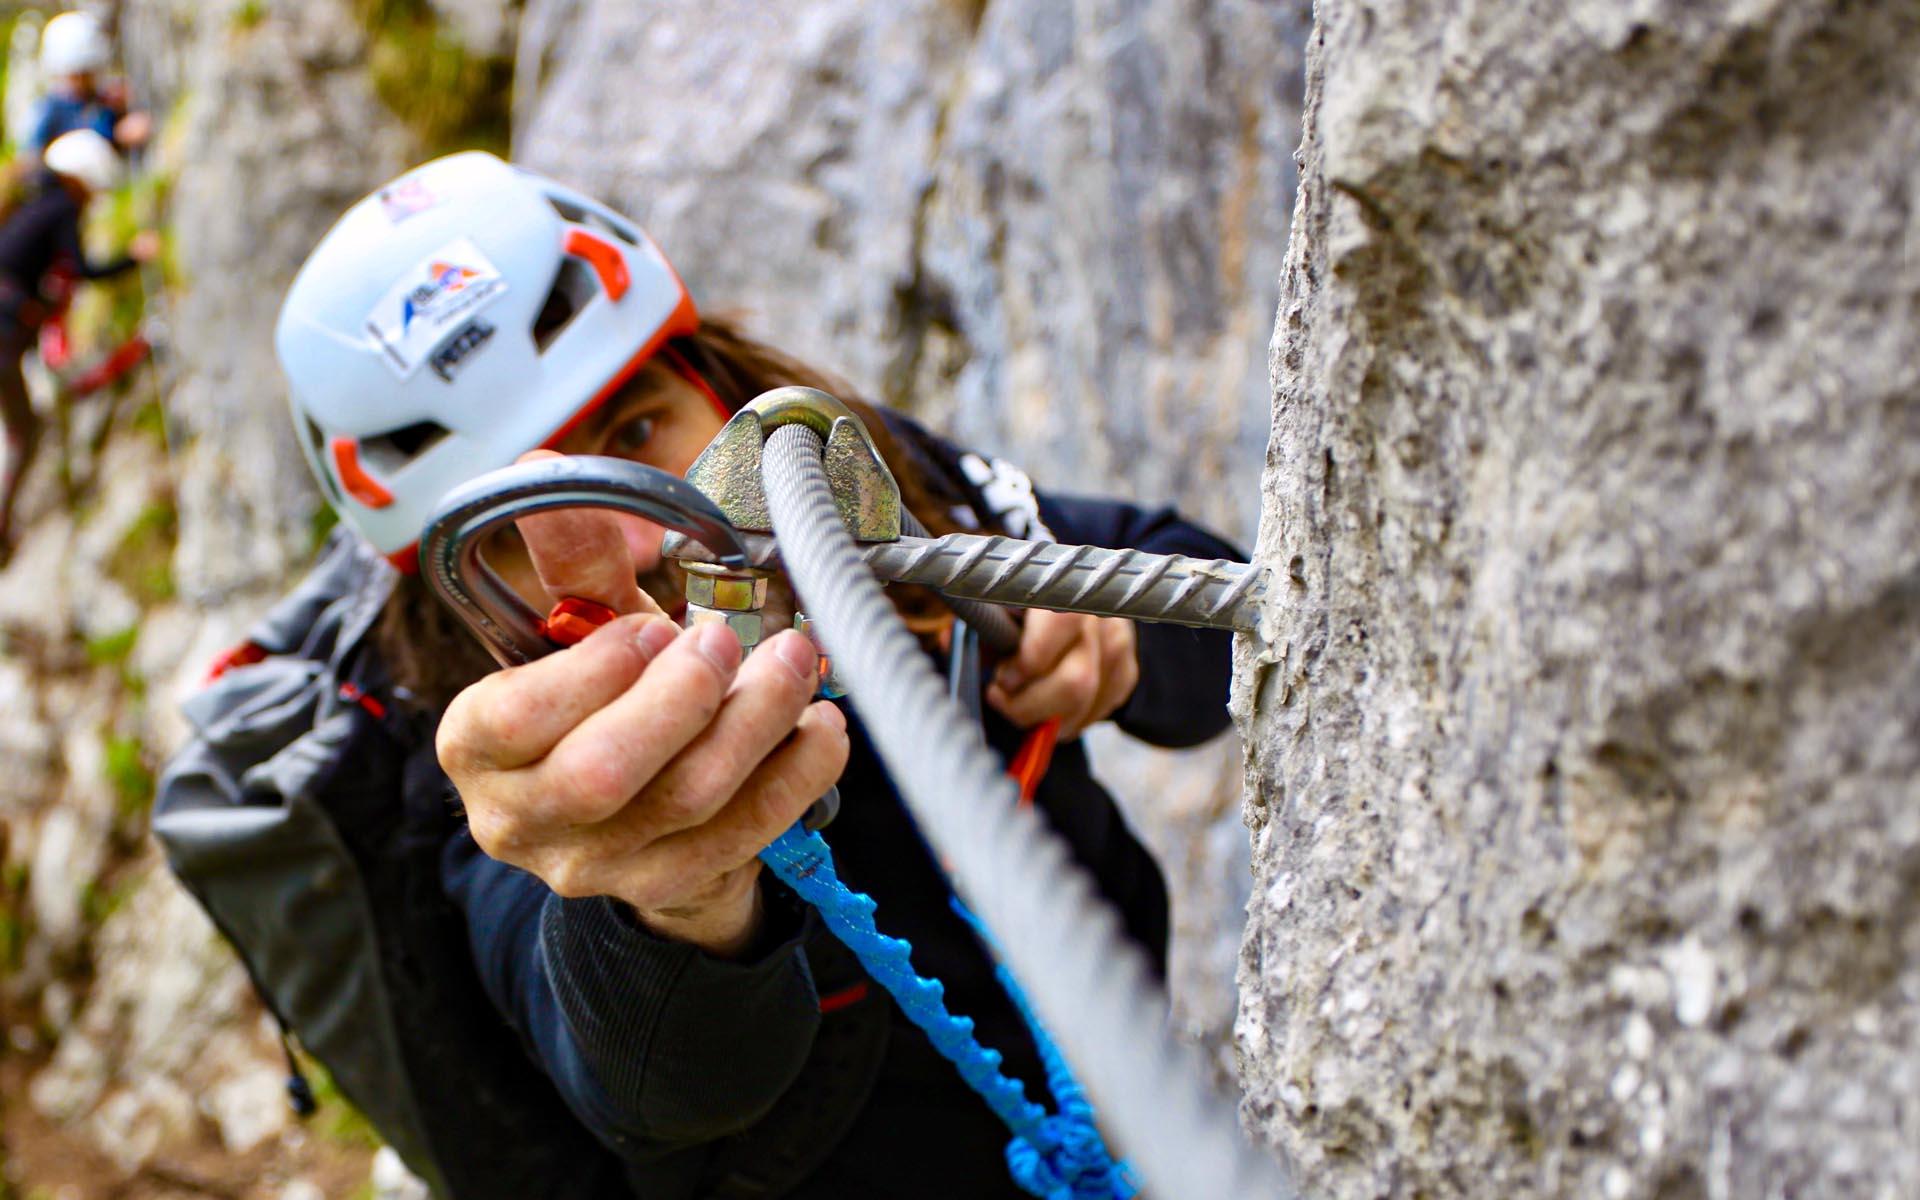 Klettersteigset Verleih Berchtesgaden : Klettersteigschule: klettersteigschule klettersteigkurs